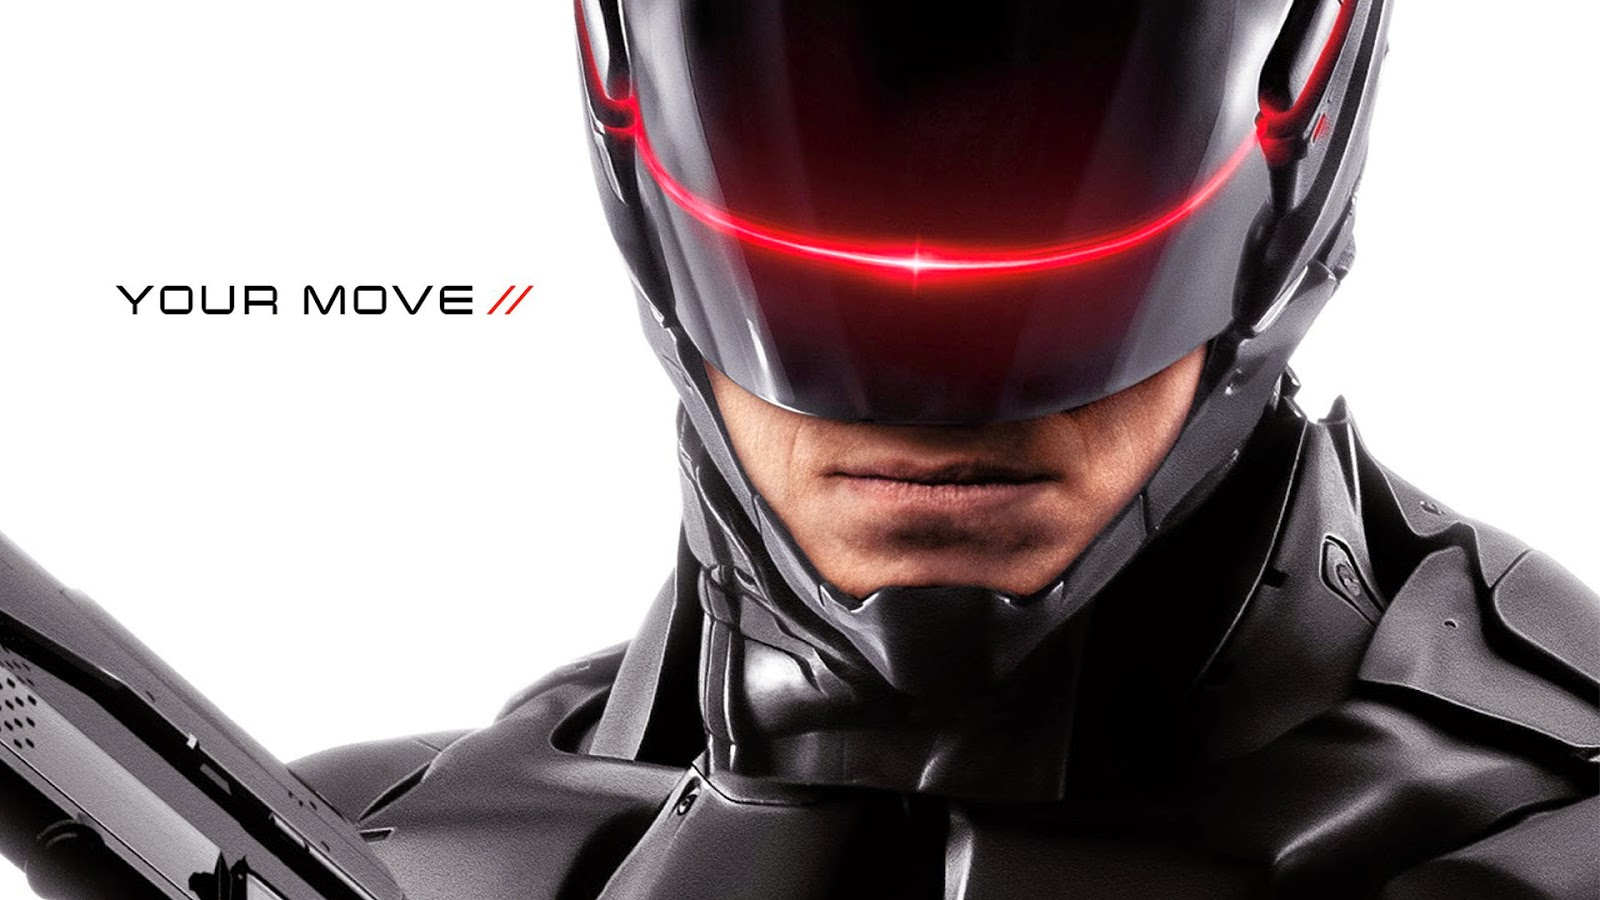 Robocop Movie 2014 Wallpaper